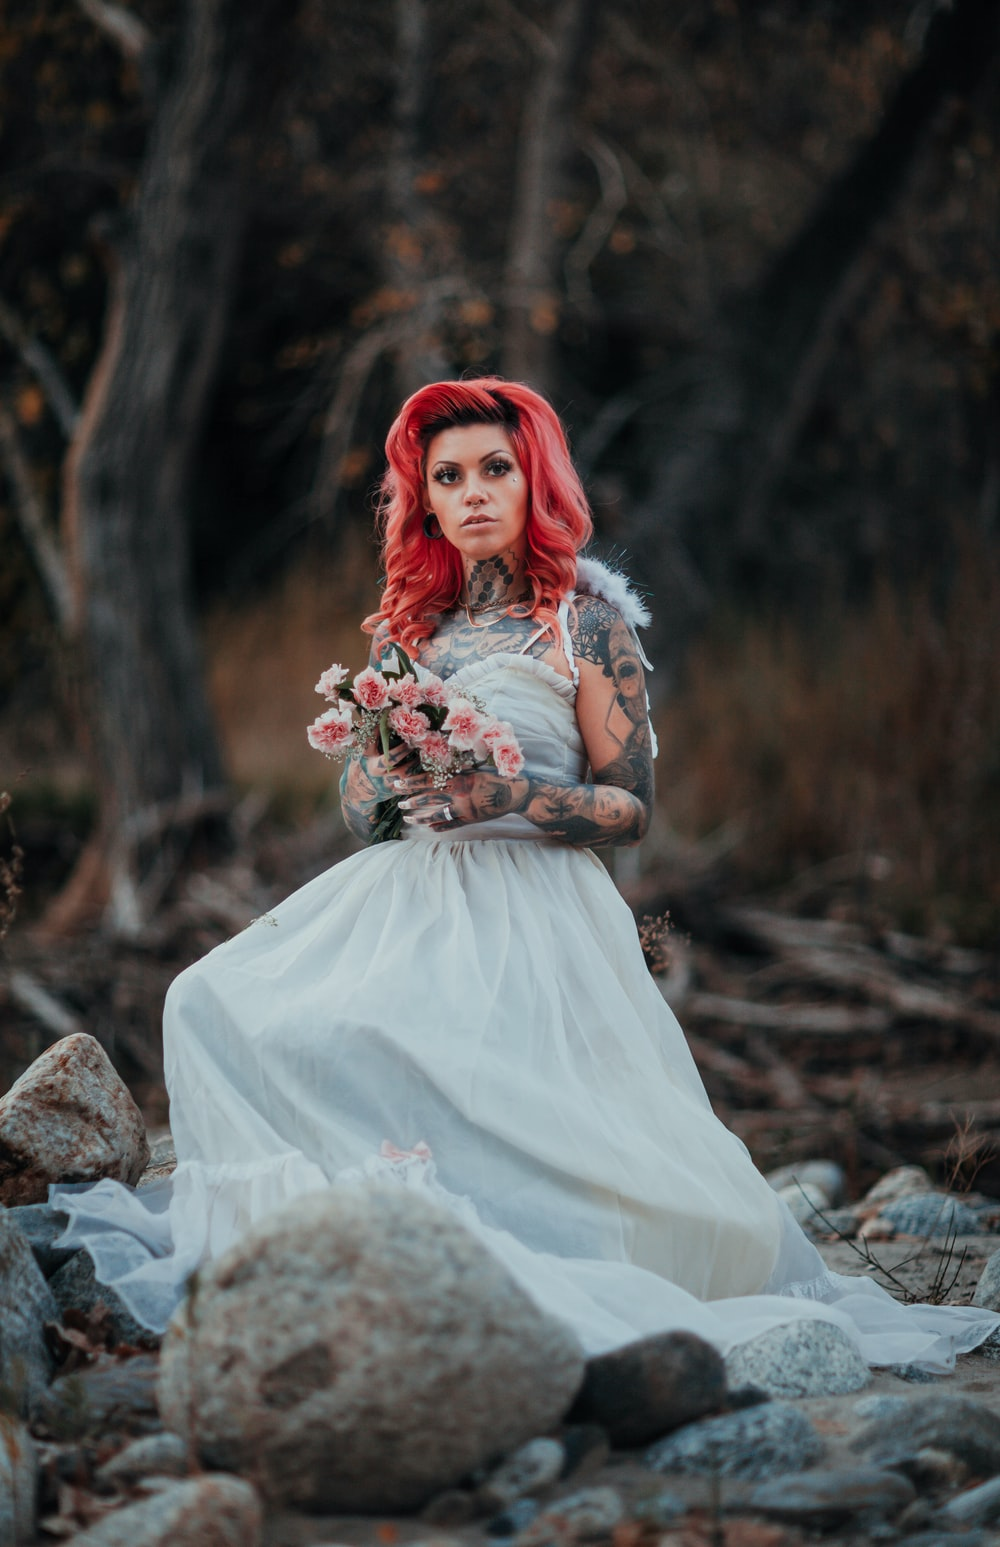 woman in white dress sitting on rock